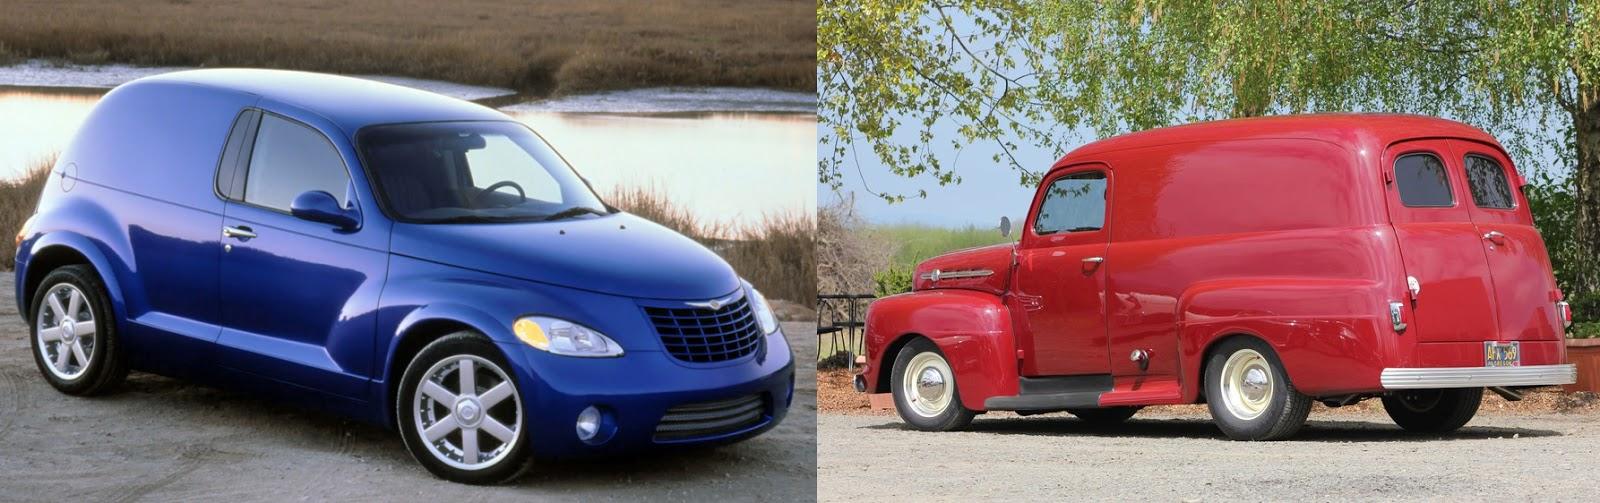 Imagem das fotos do PT Cruiser Van Concept (direita) e Chevy Panel Truck (esquerda)